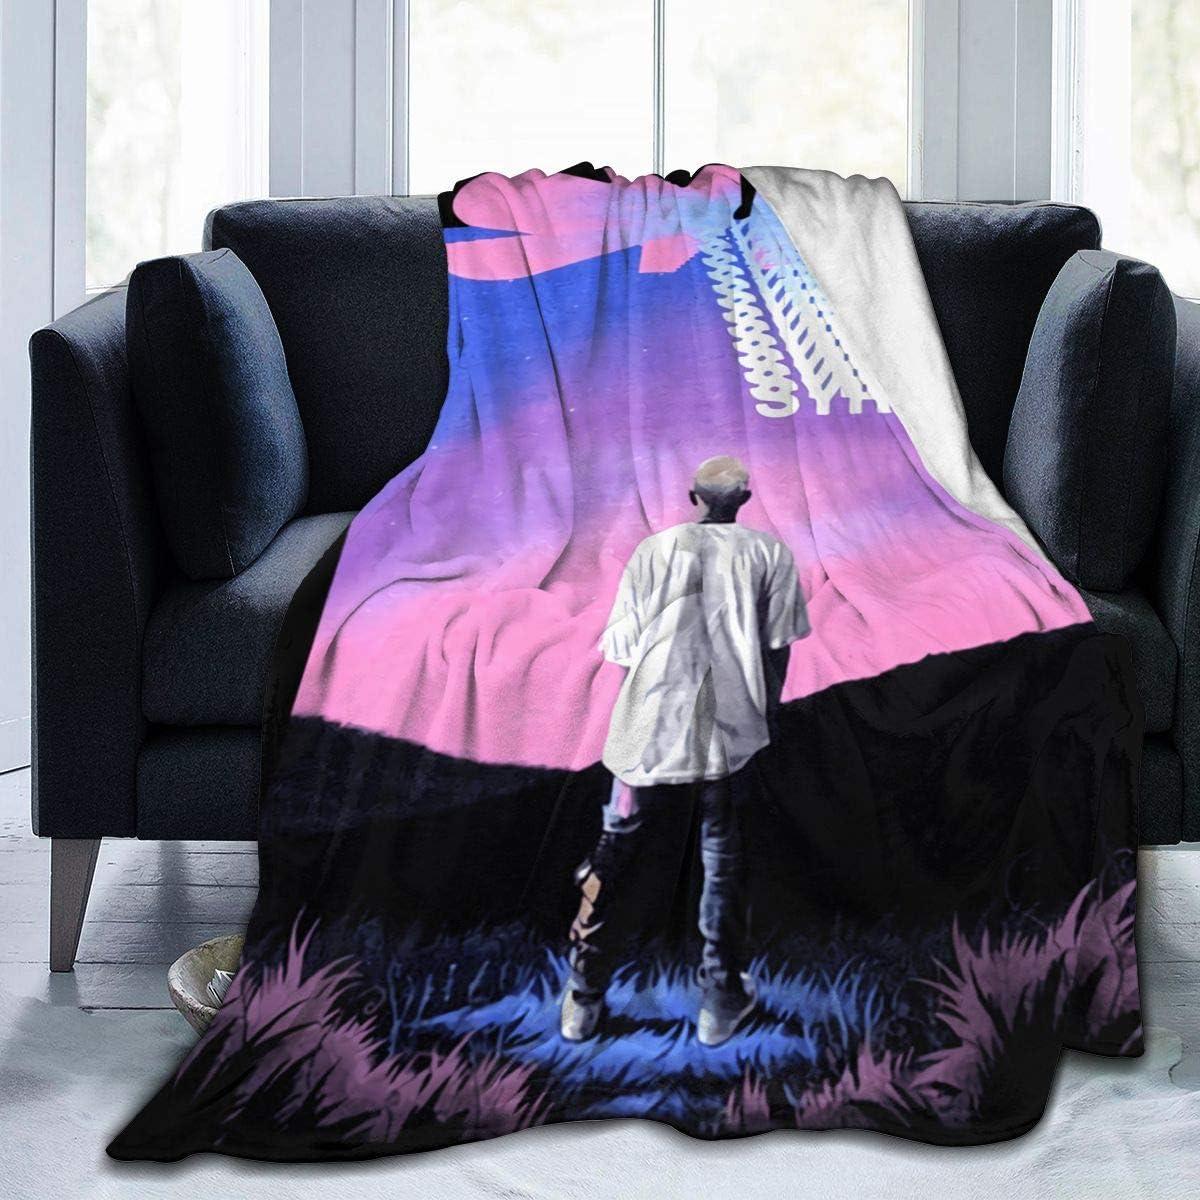 LMHBLTOP 送料無料/新品 Syre Jaden Smith Fleece Ultra-Soft Thro Flannel 男女兼用 Blanket